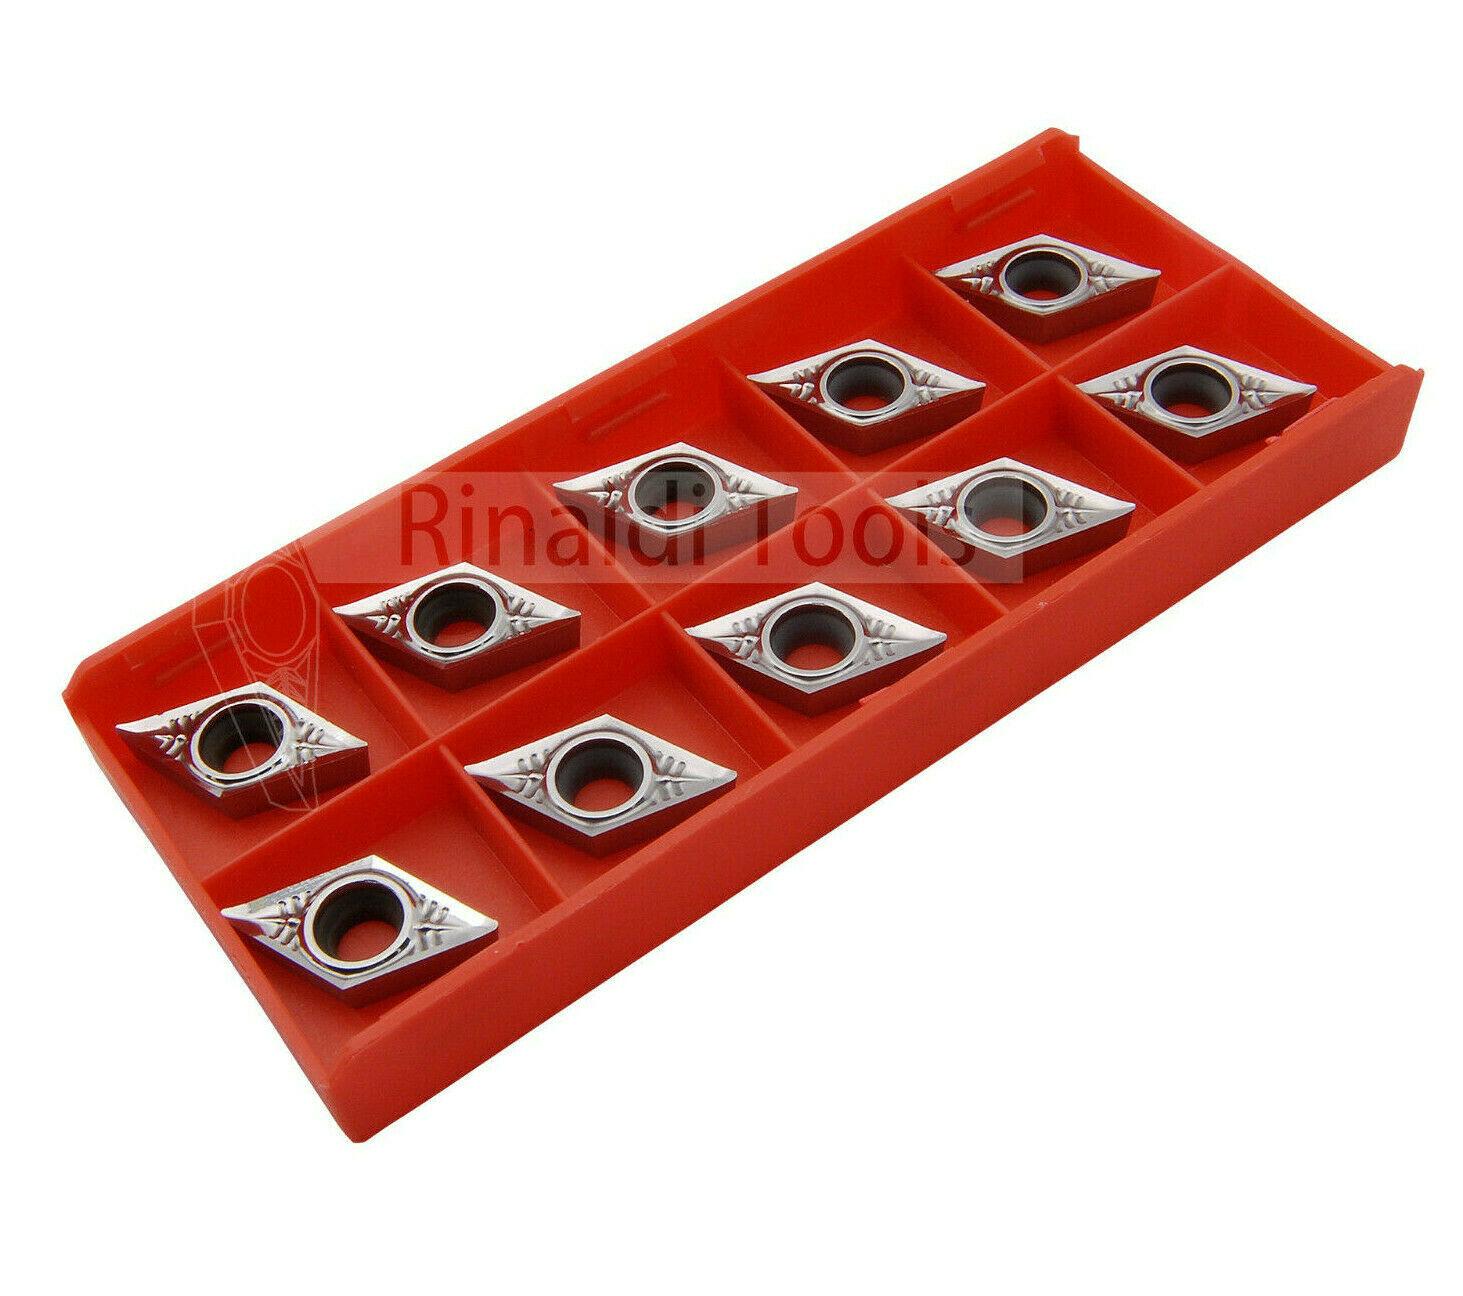 10 x DCGT11T304-AL RT100 (K10) polierte Spanfläche